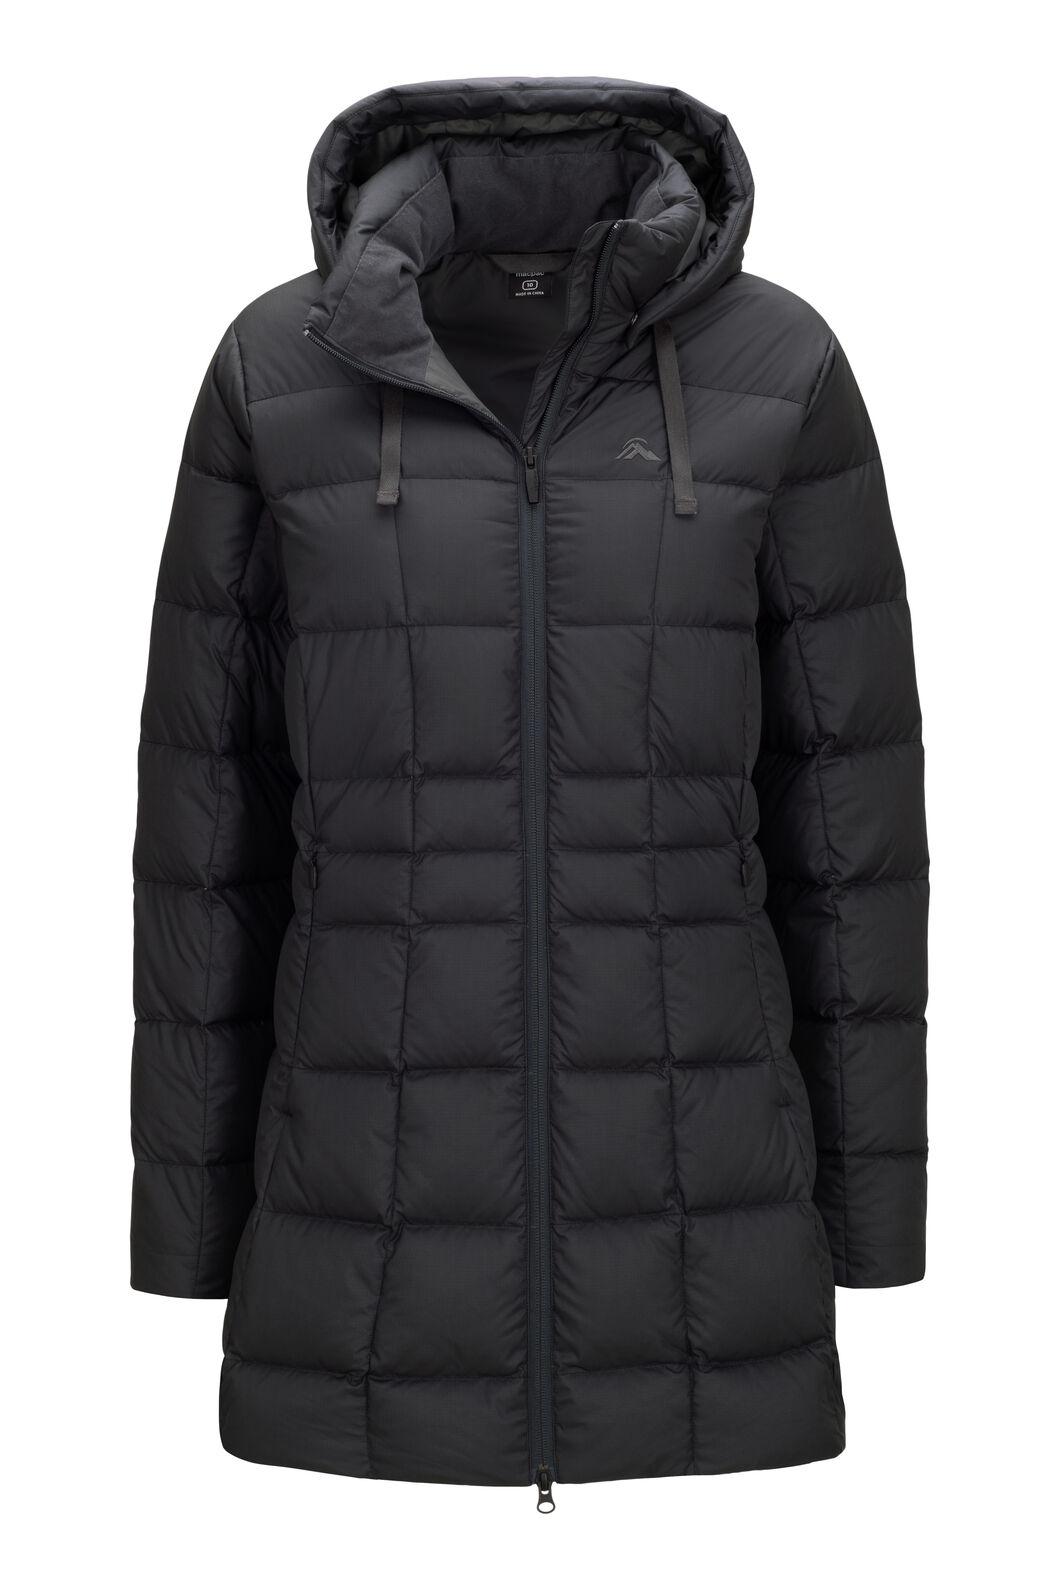 Macpac Aurora Hooded Down Coat — Women's, Black, hi-res